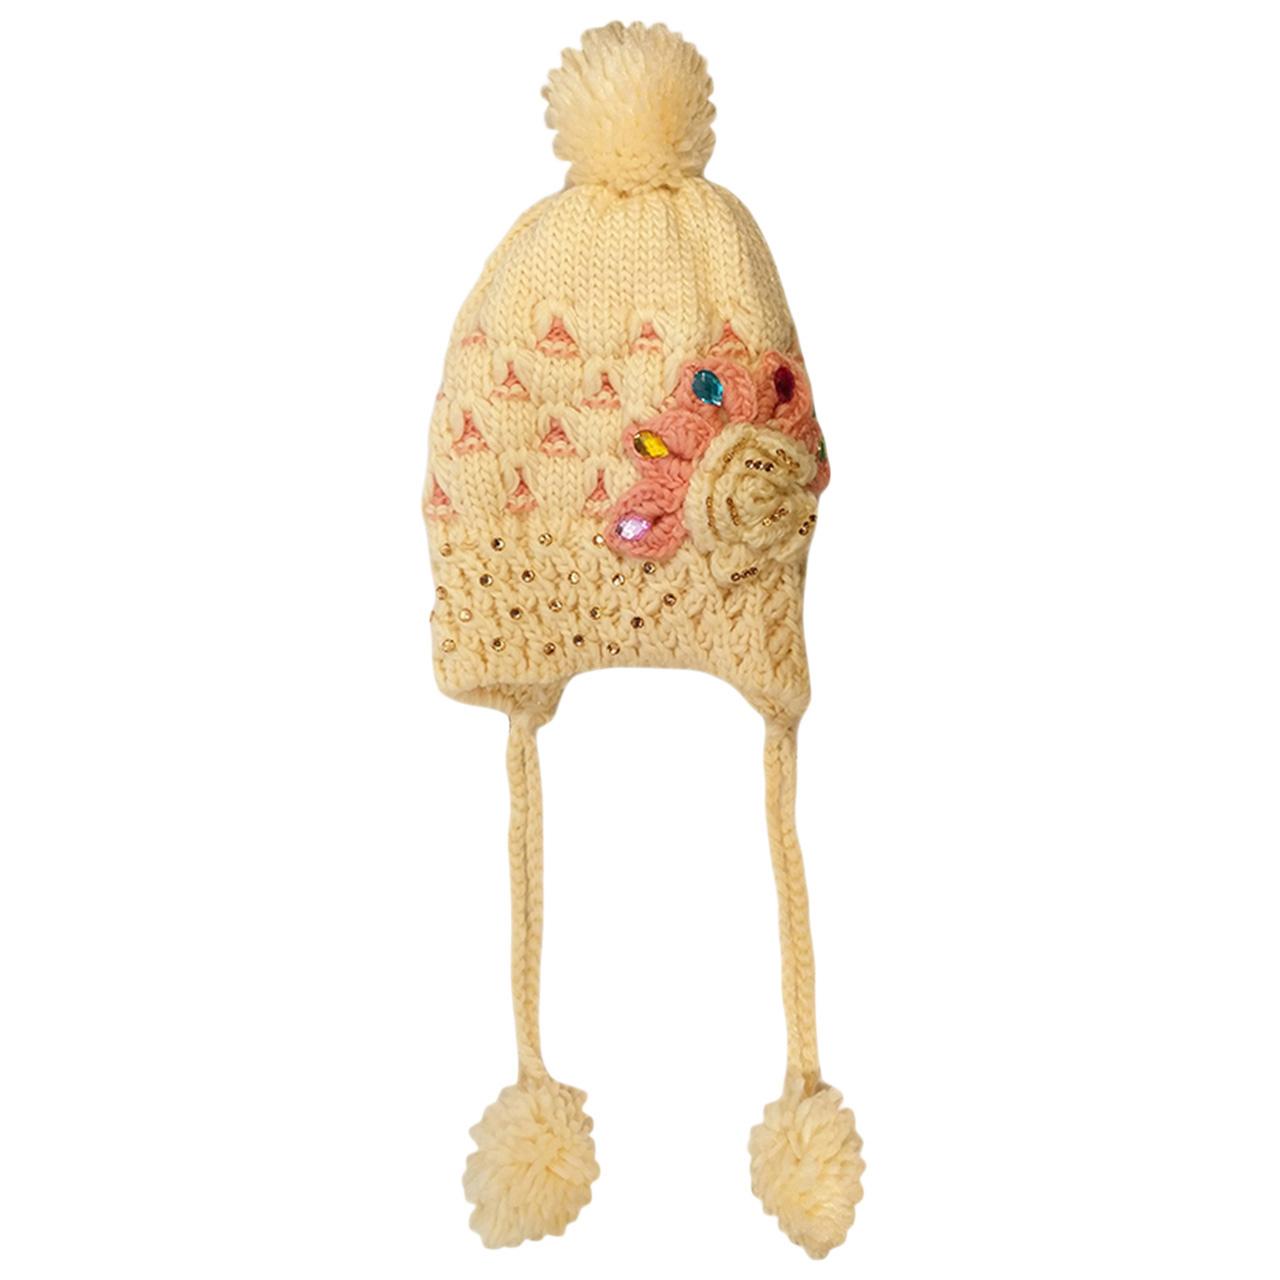 کلاه بافتنی دخترانه کد FLOWER_PIDS89